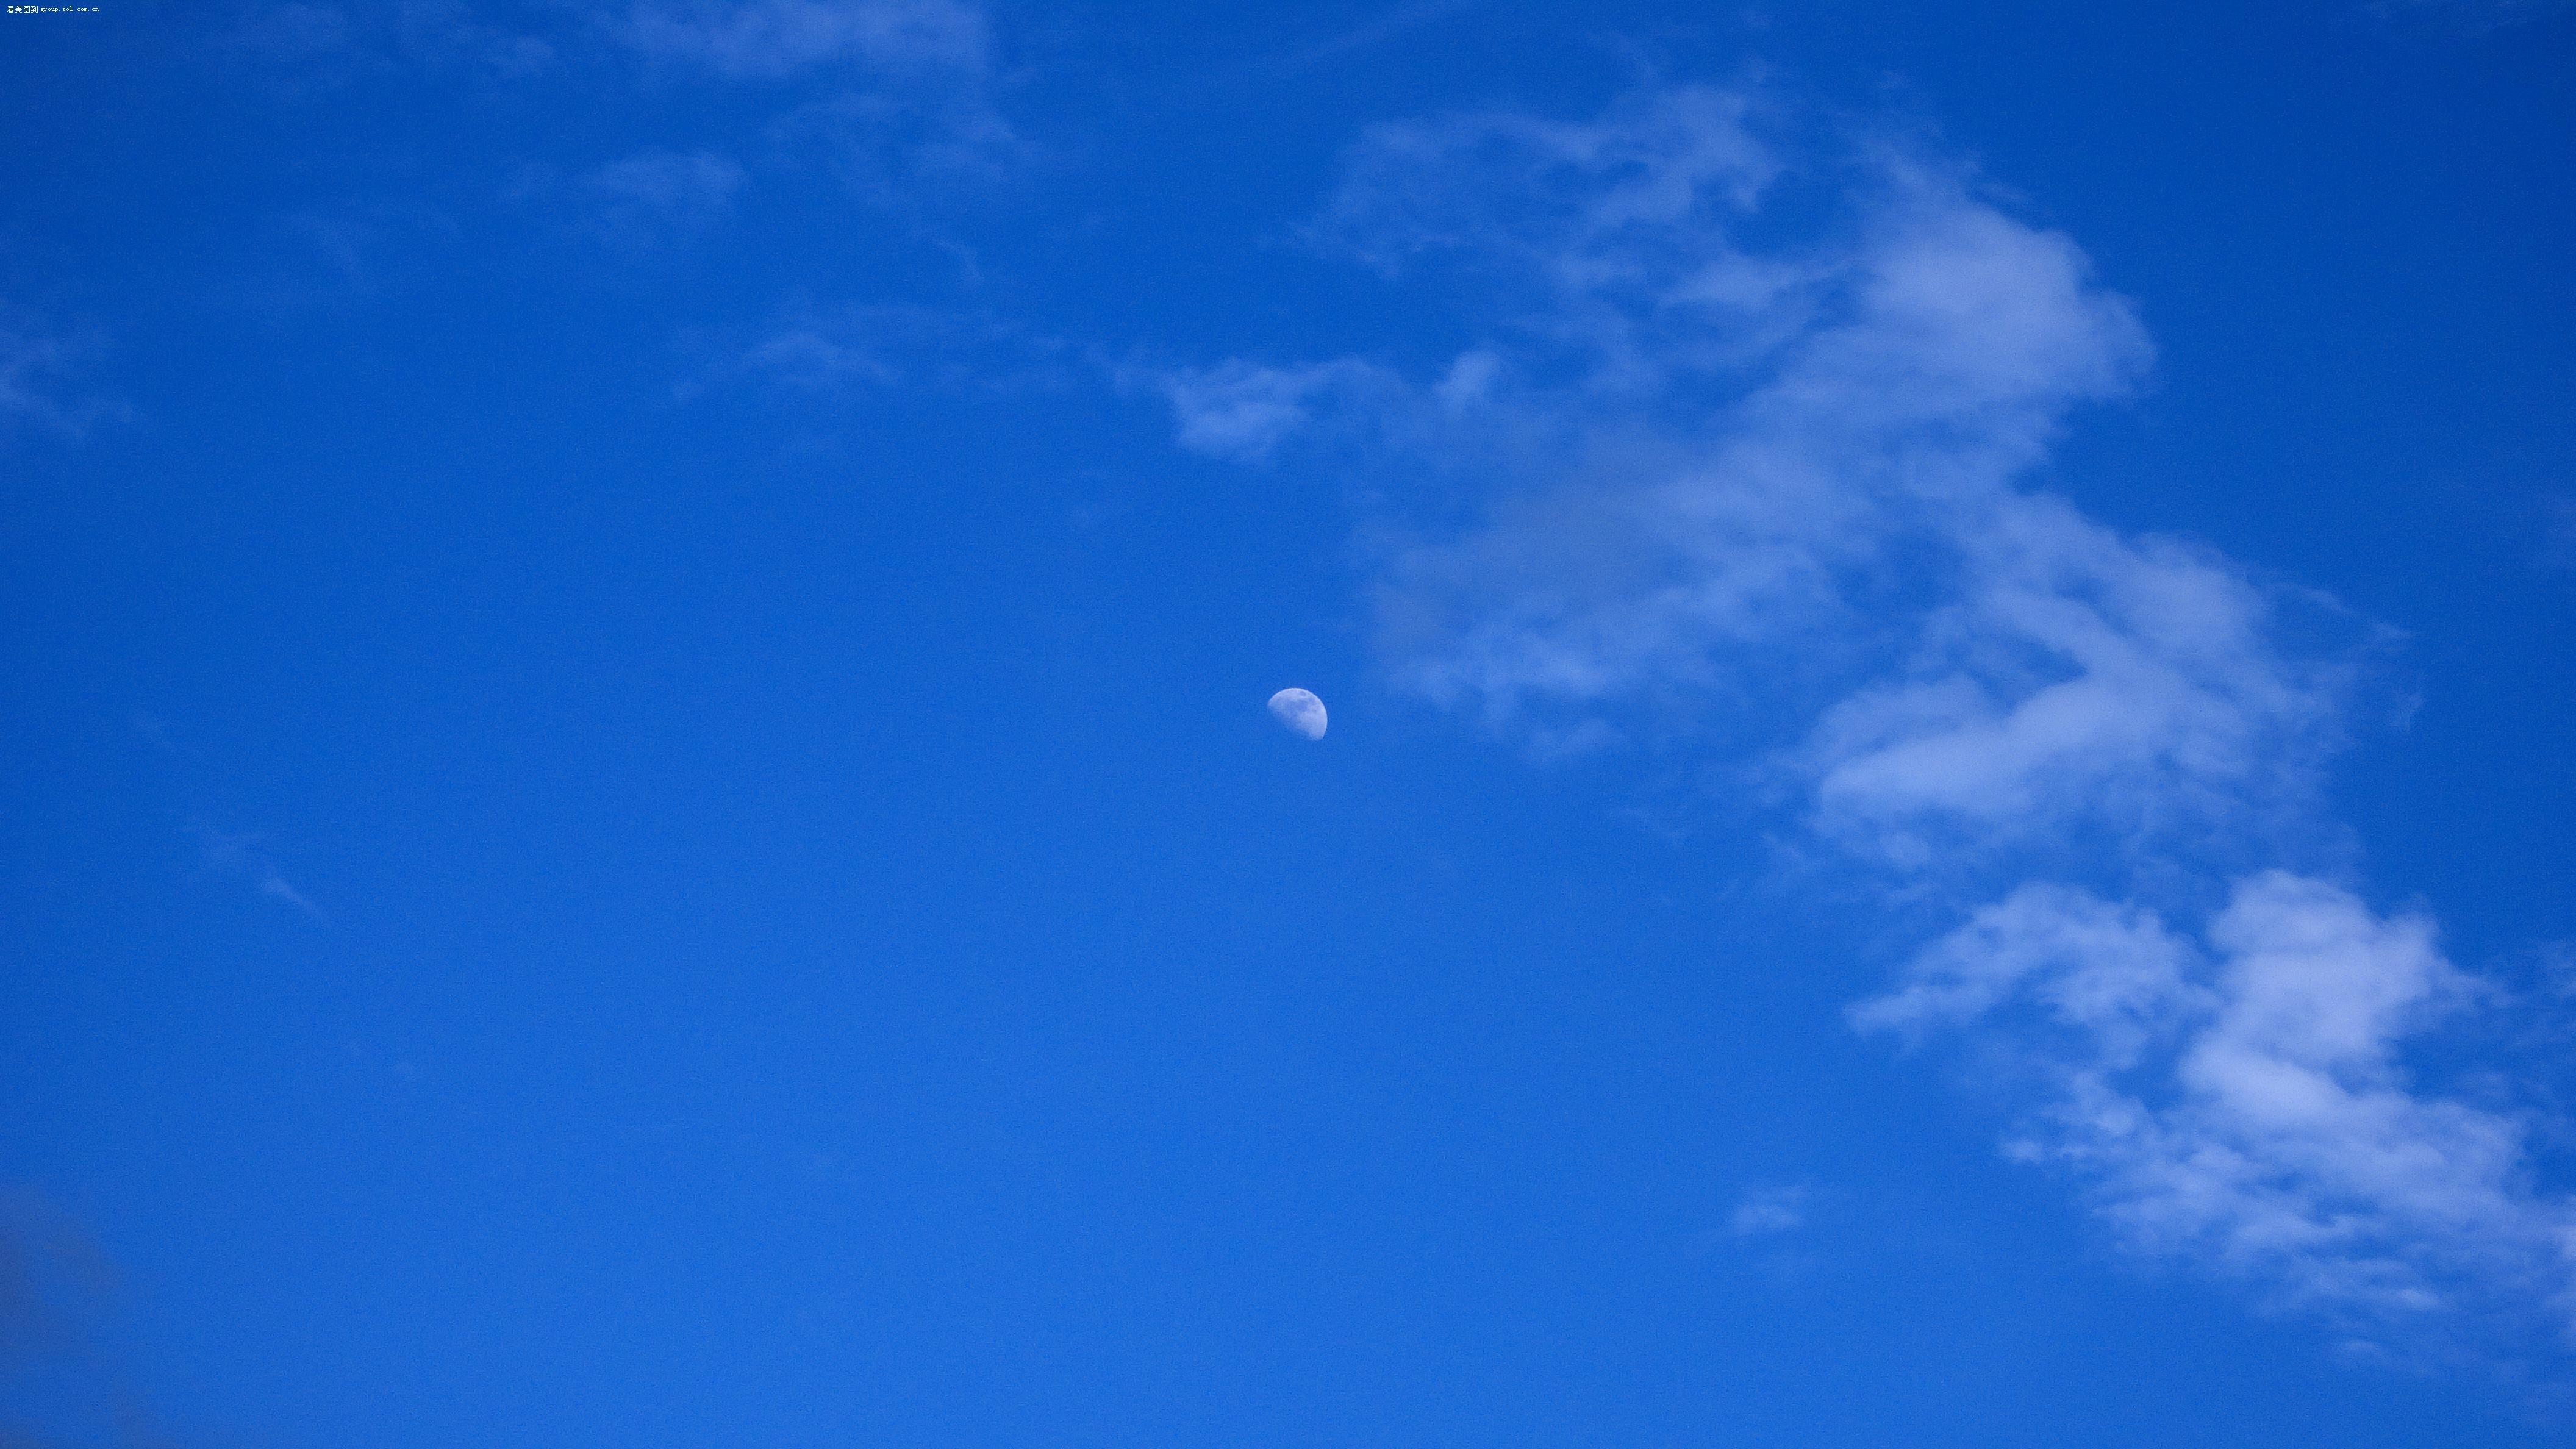 【lx2拍月亮,意境不错哦】松下